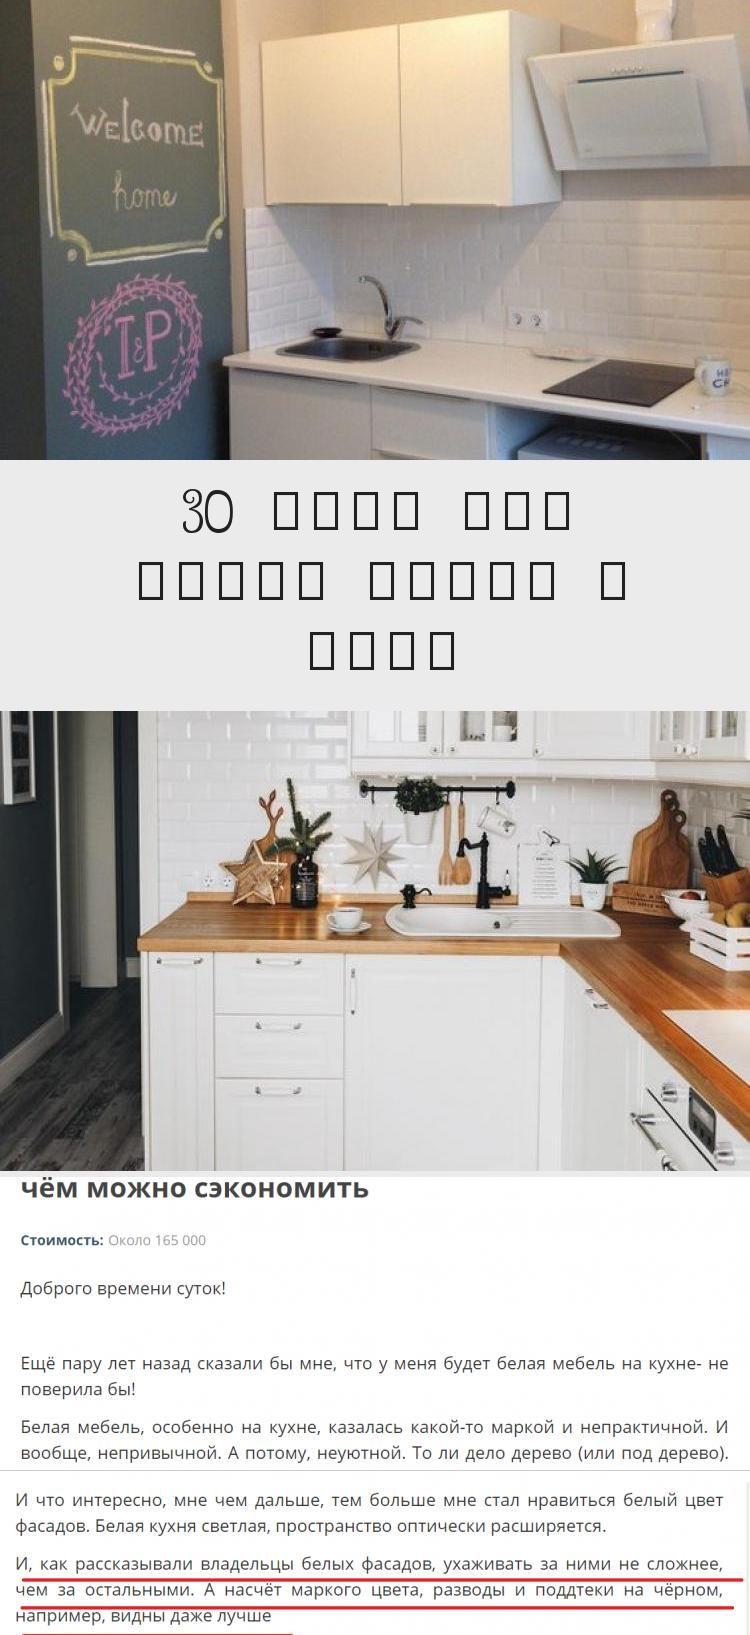 кухни икеа спб каталог цены